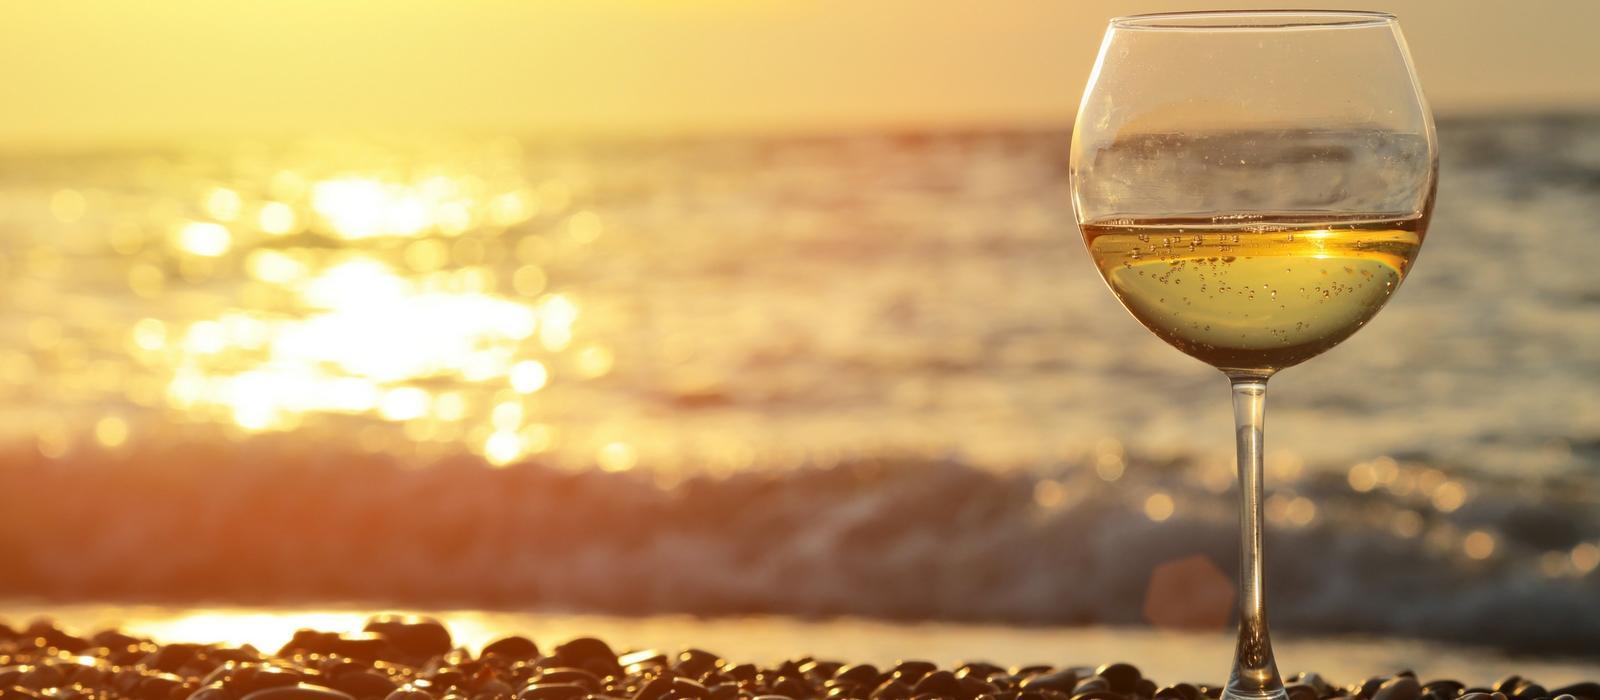 Drinking On The Beach